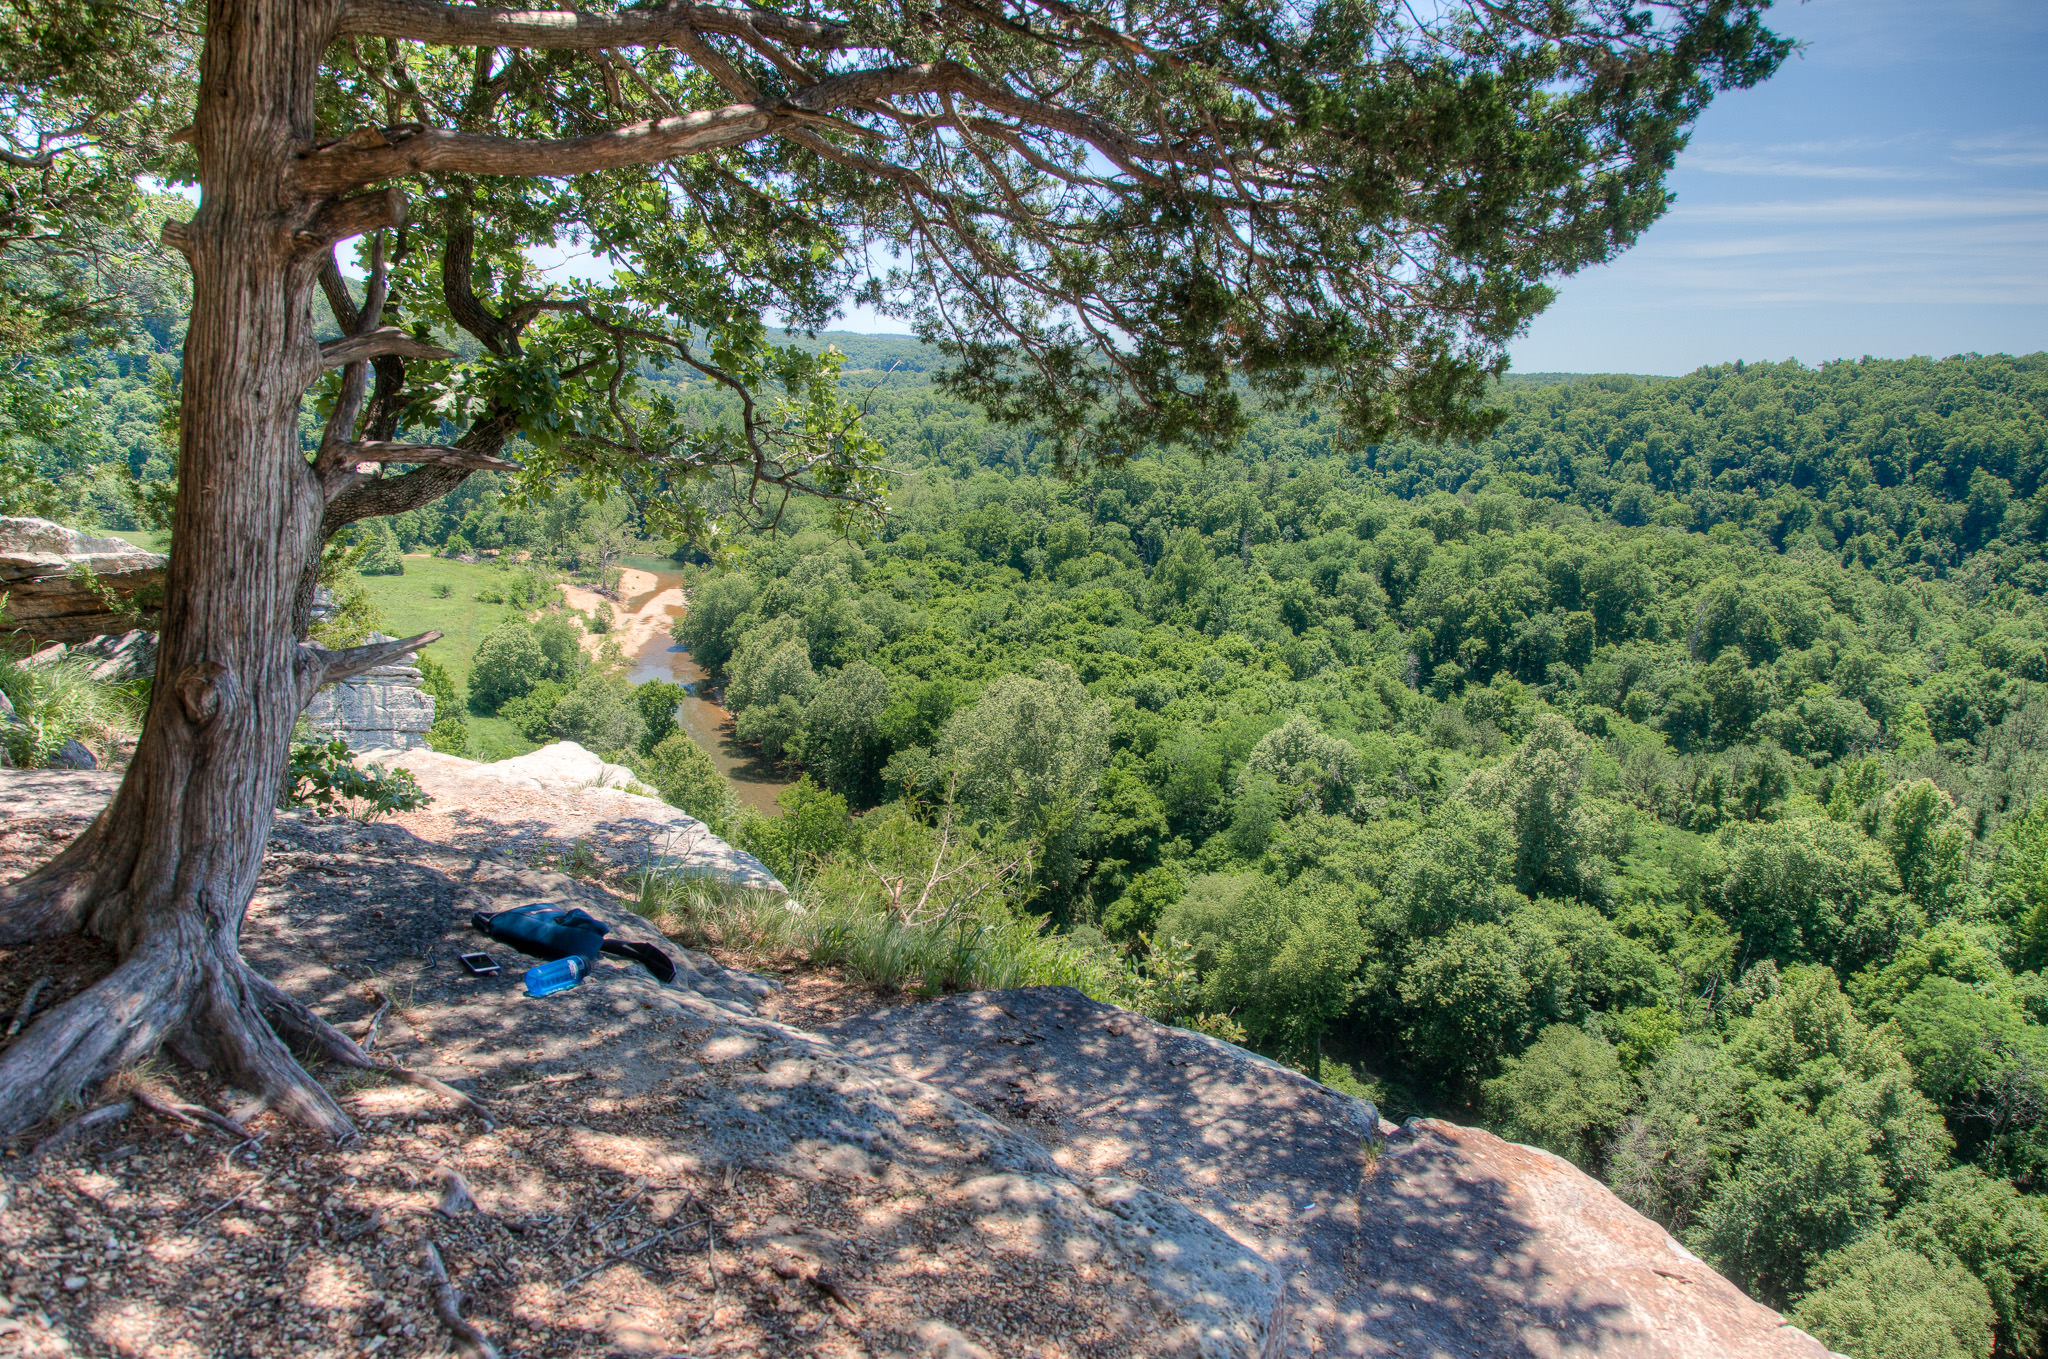 Kings River Overlook